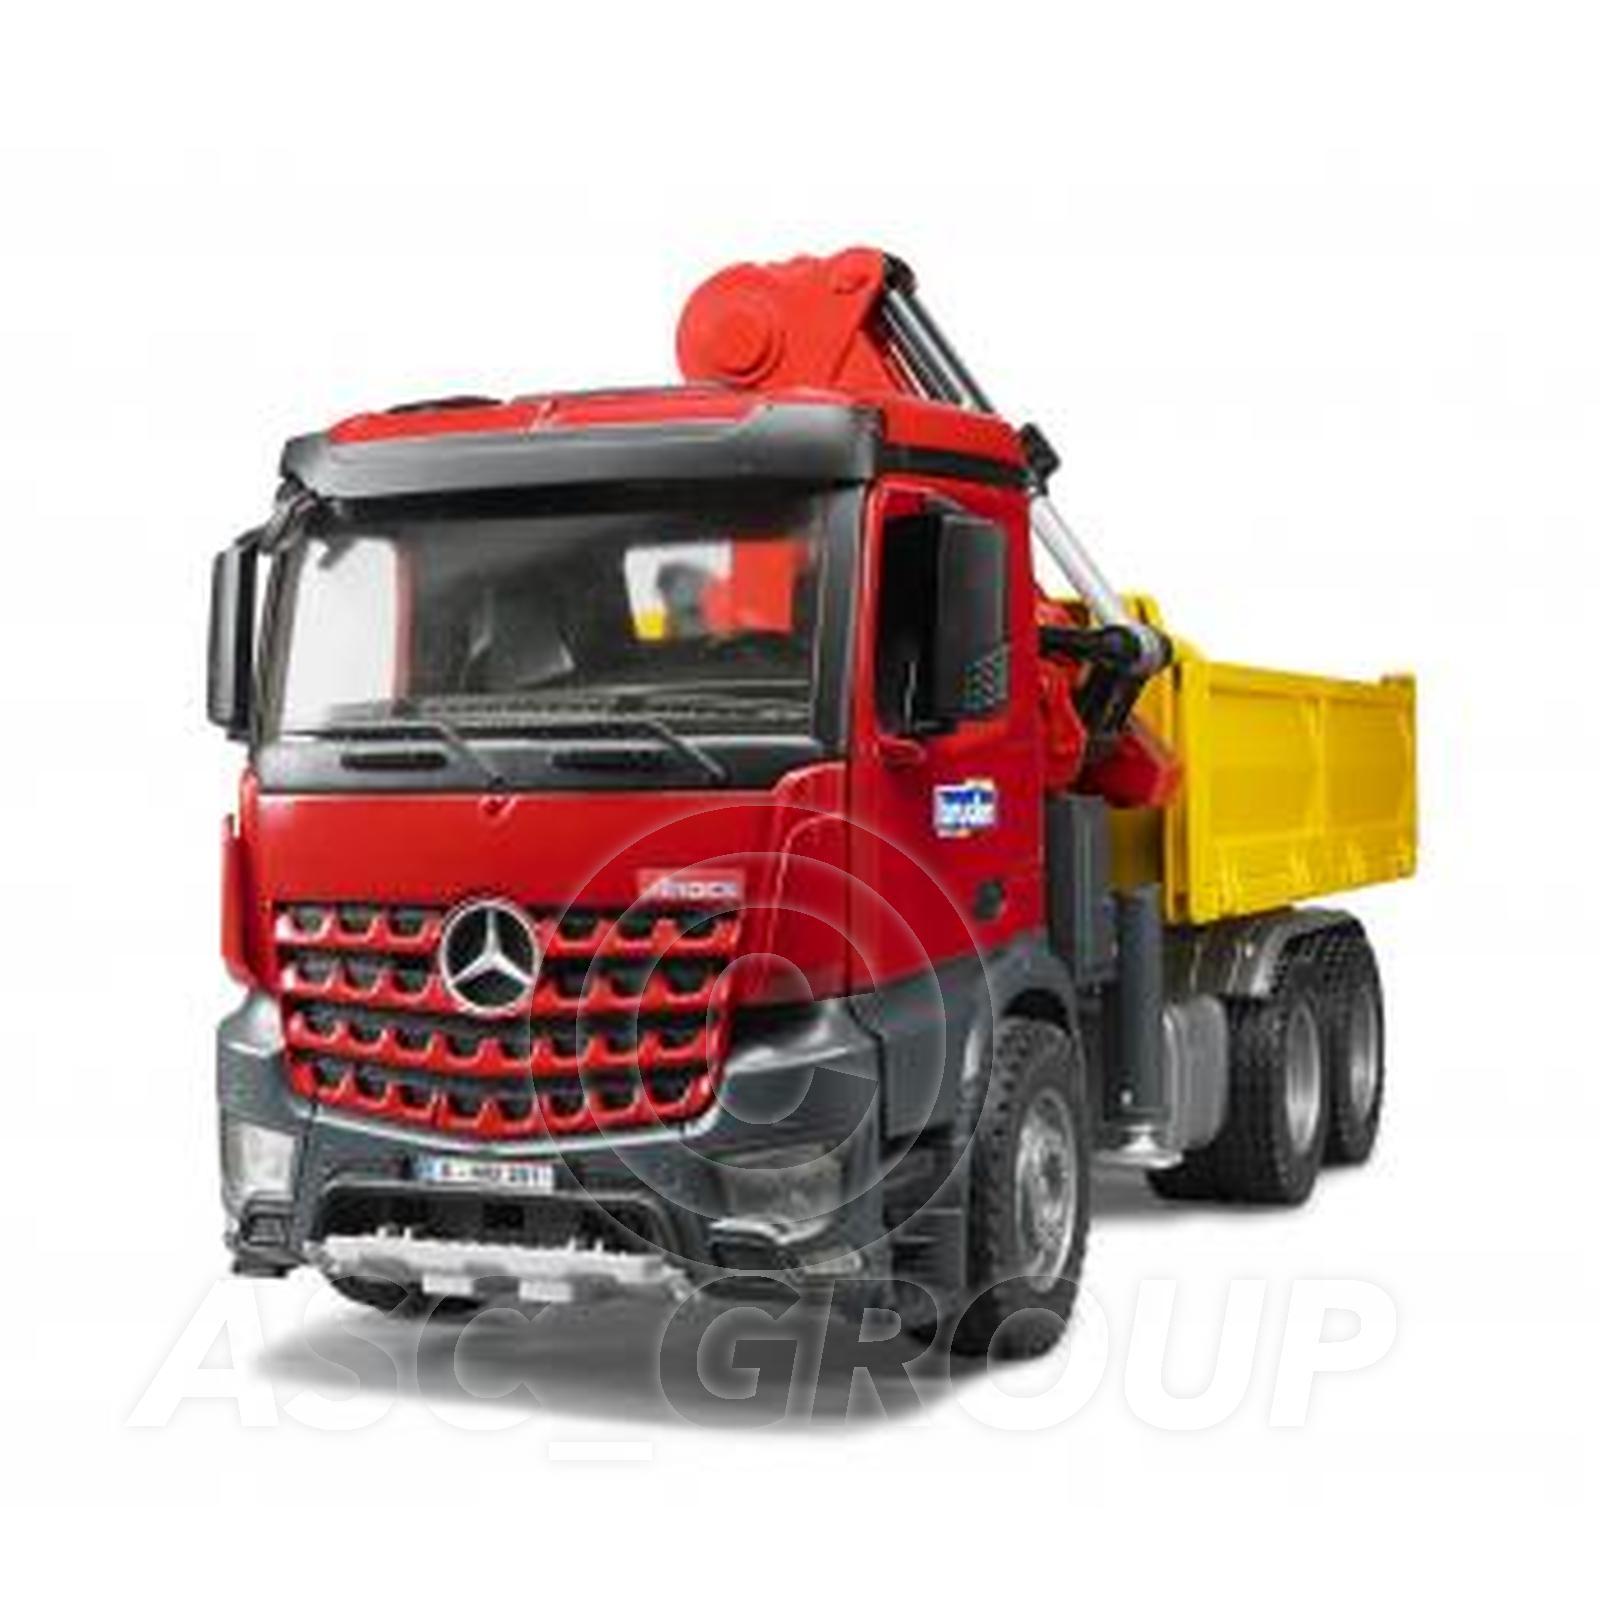 bruder toys 03651 pro series mercedes benz mb arocs truck